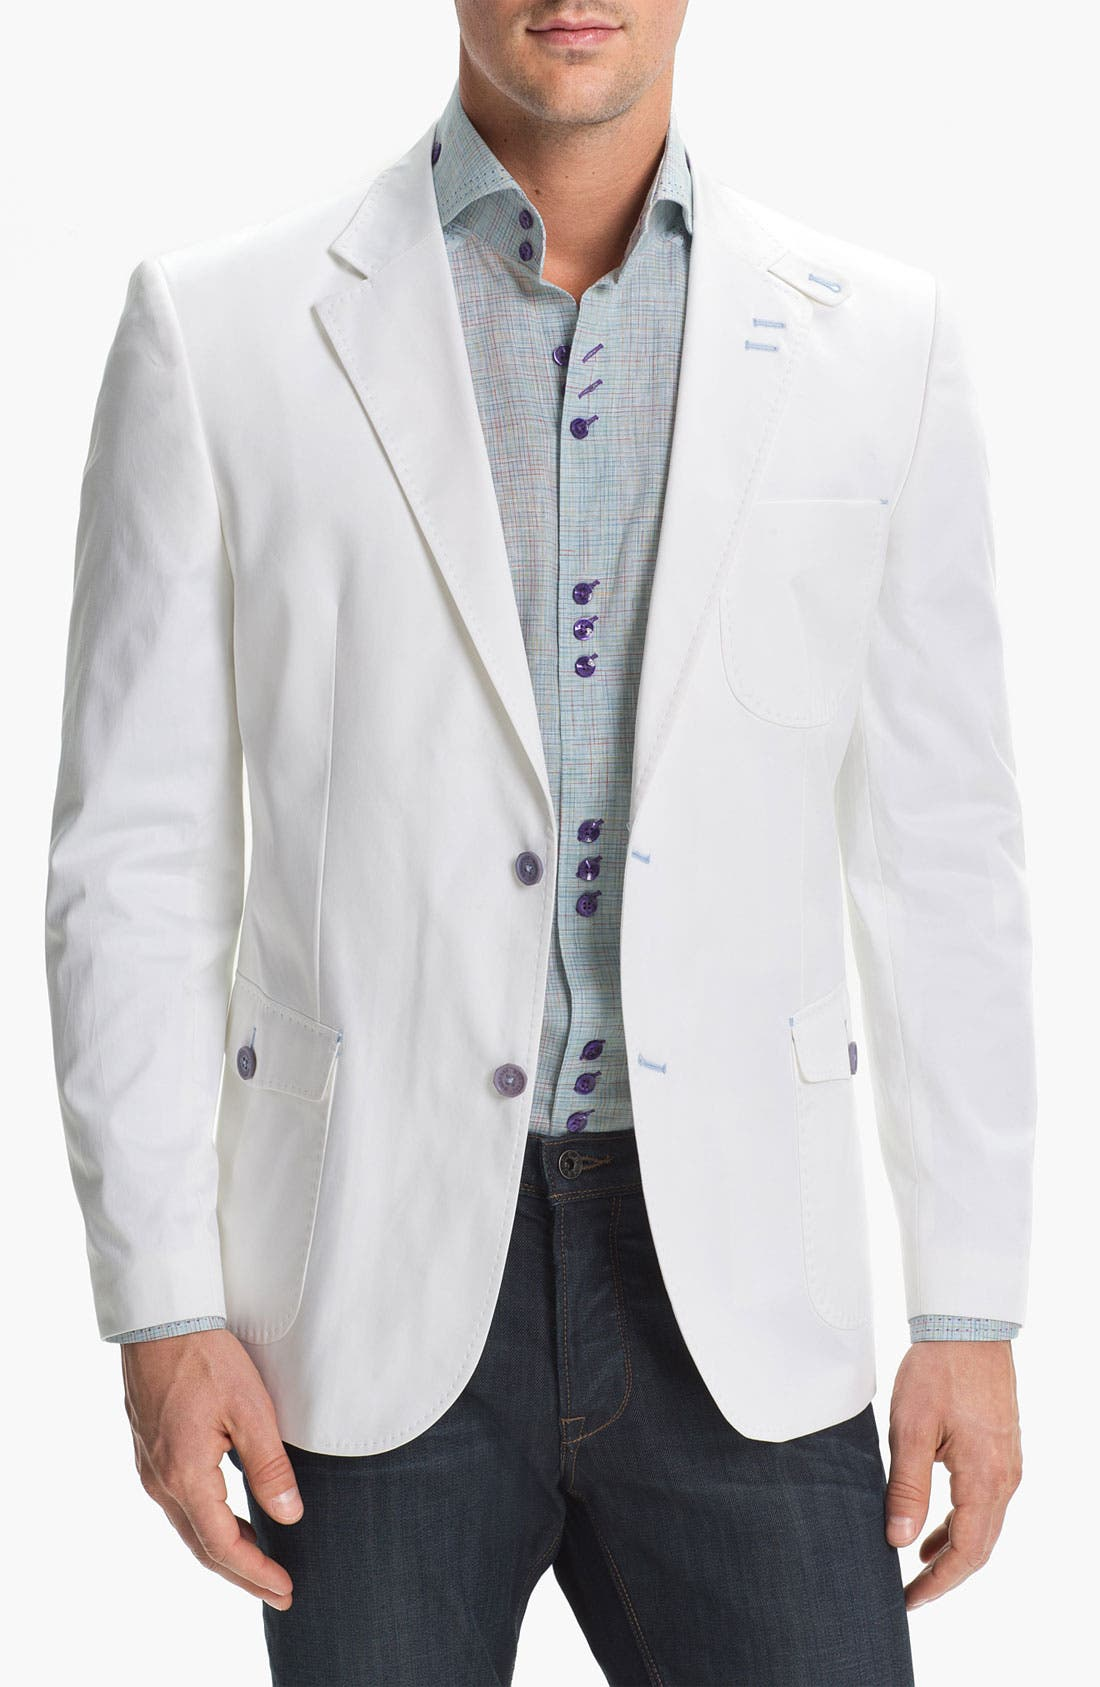 Main Image - Bogosse 'Russ 01' Trim Fit Cotton Blazer